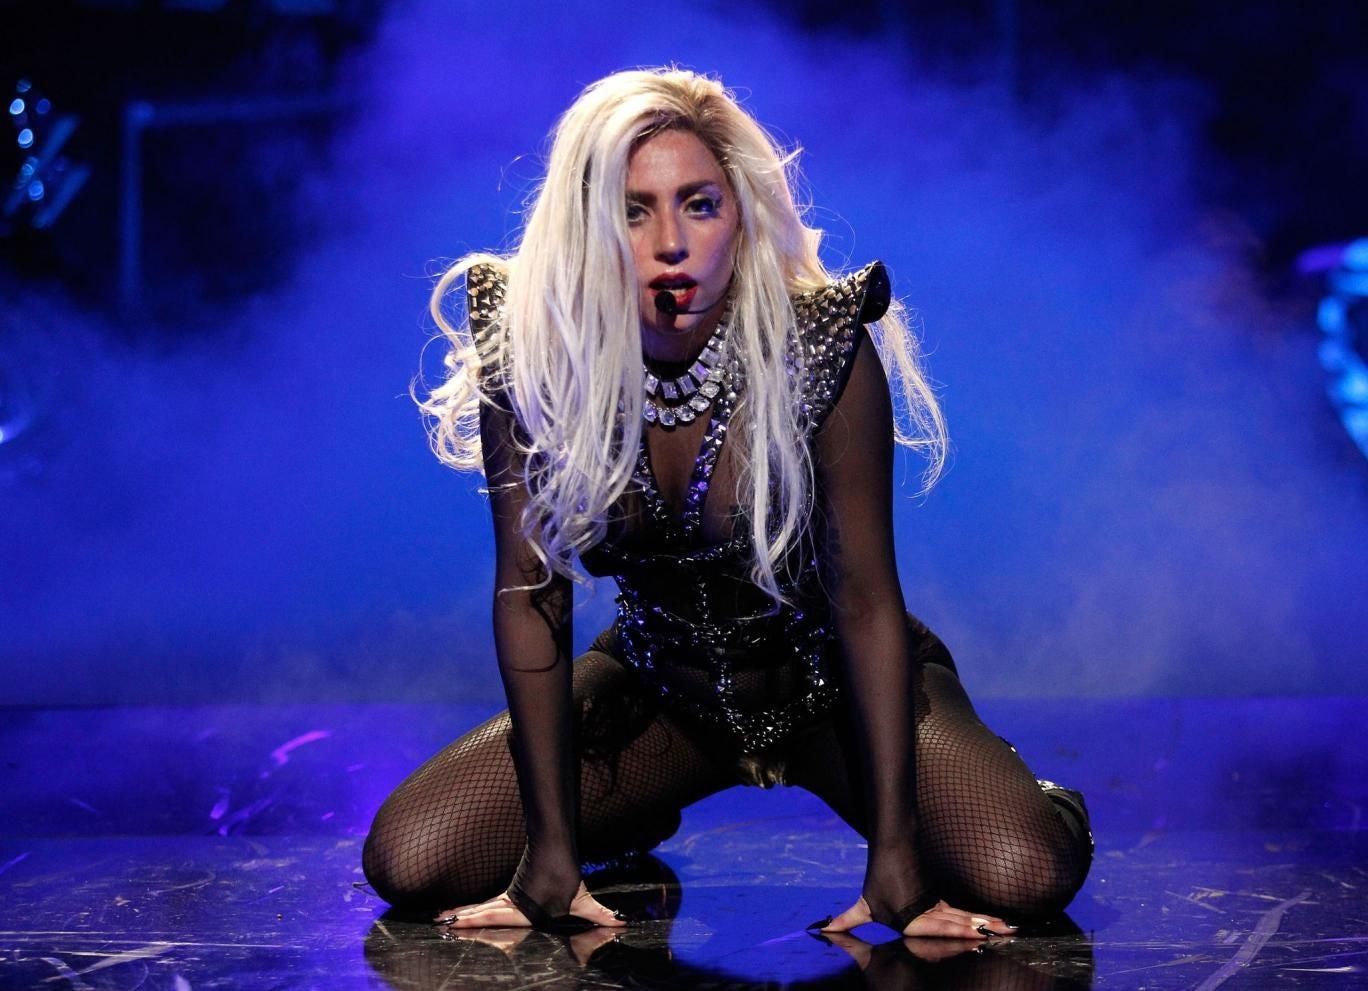 Lady Gaga performing live